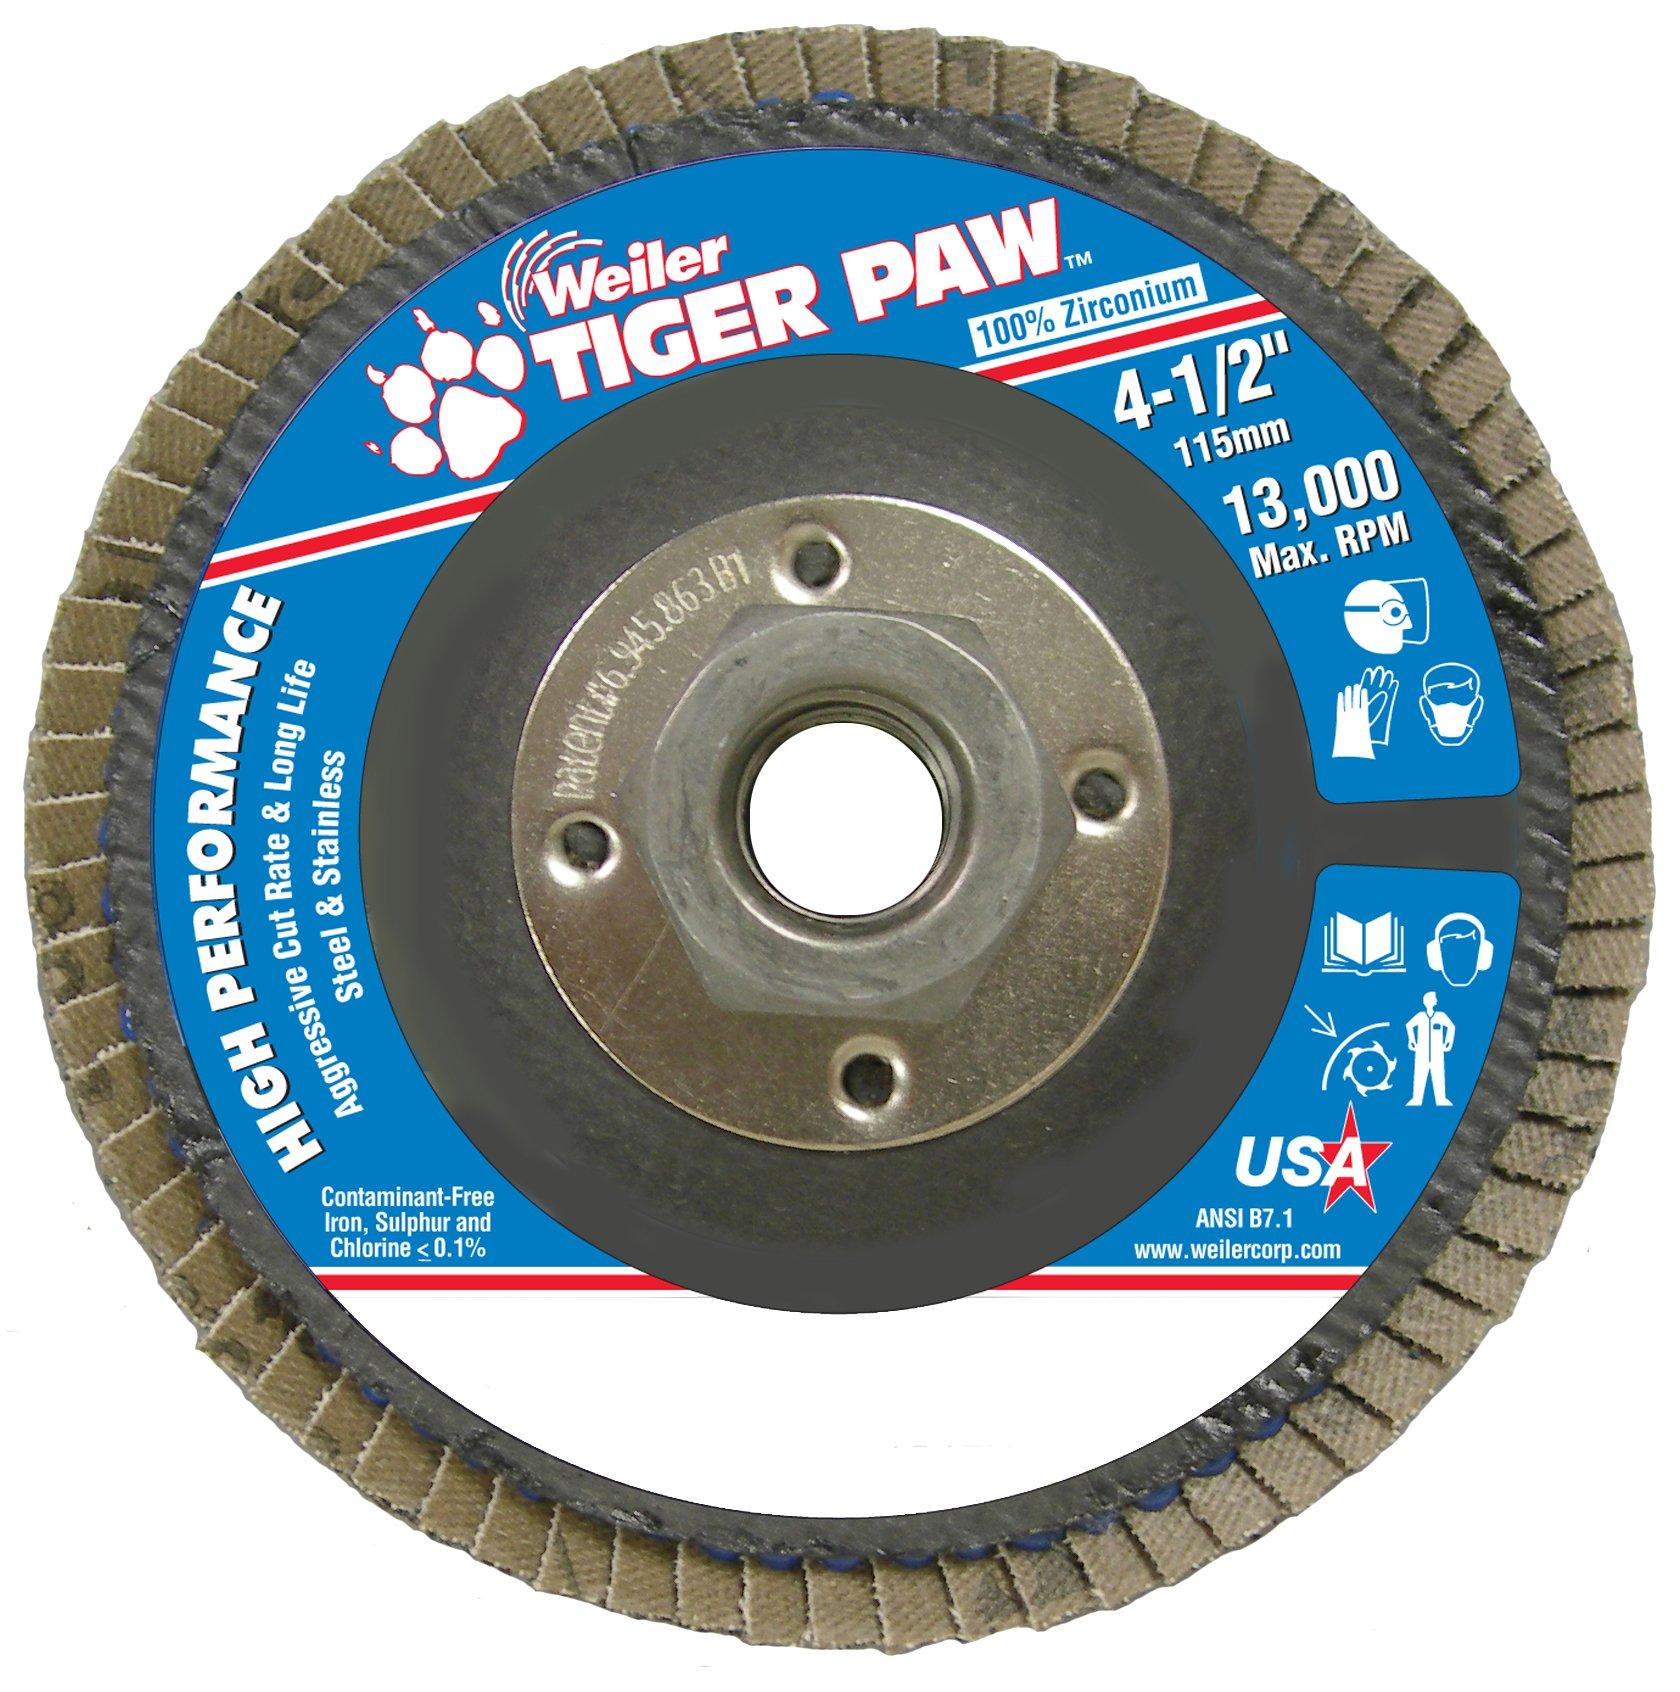 Weiler 51114 Tiger Paw High Performance Abrasive Flap Disc, Type 27 Flat Style, Phenolic Backing, Zirconia Alumina, 4-1/2'' Diameter, 5/8''-11 Arbor, 60 Grit, 13000 RPM (Pack of 10)